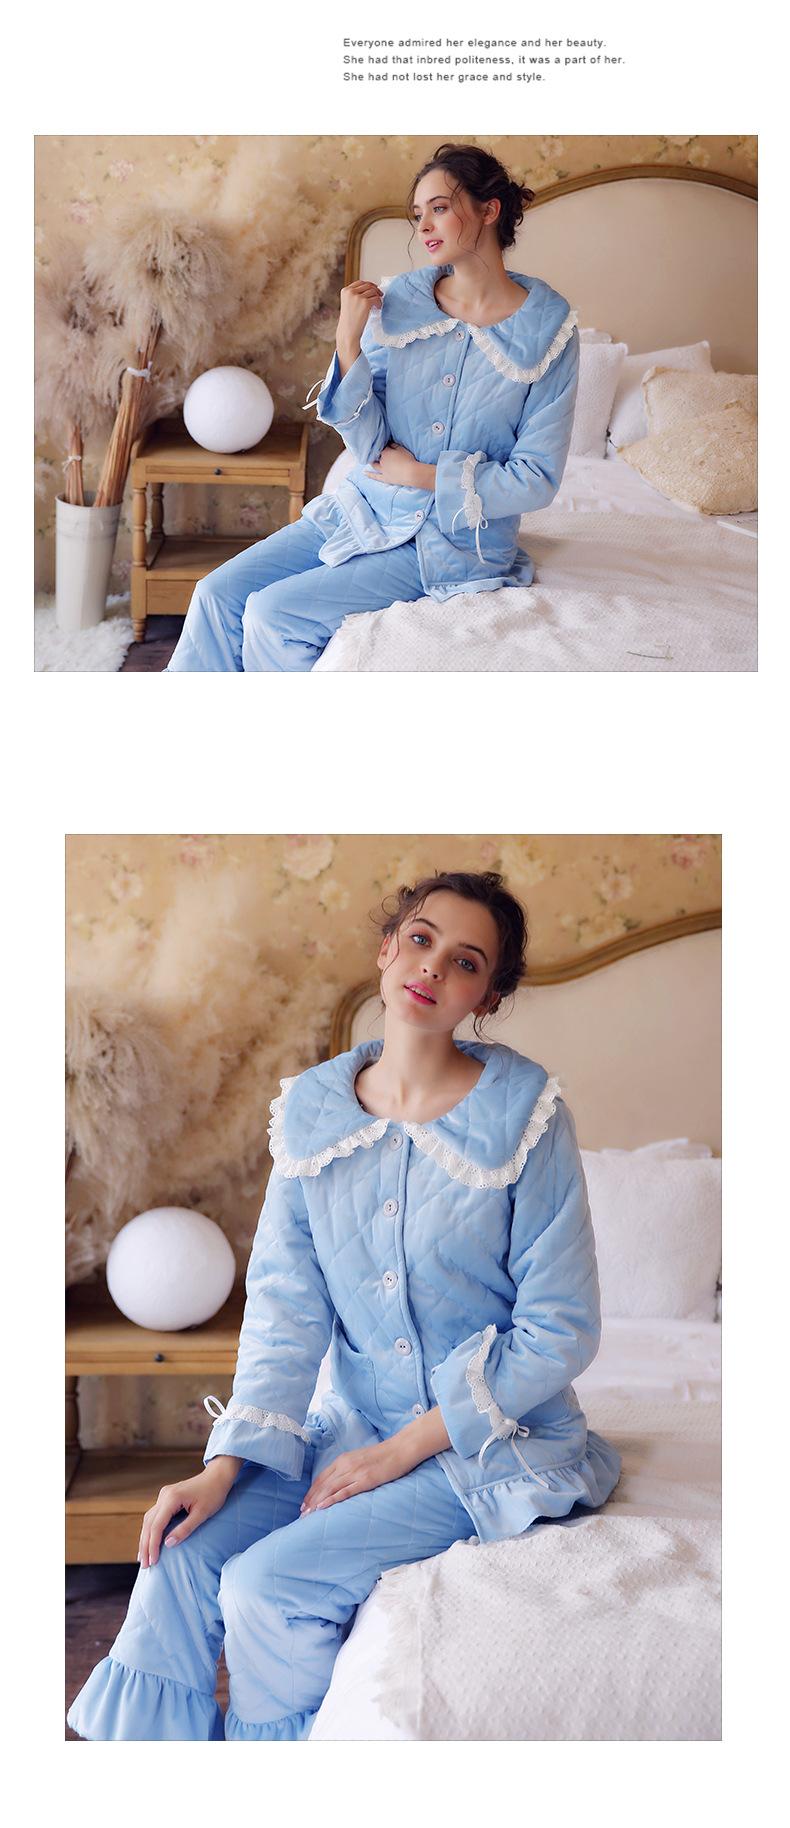 Autumn Winter New Ladies Thick Long-sleeved Cotton Princess Pijama Pregnant Fashion Cardigan 2PCS Maternity Pajamas Set YFQ260 5